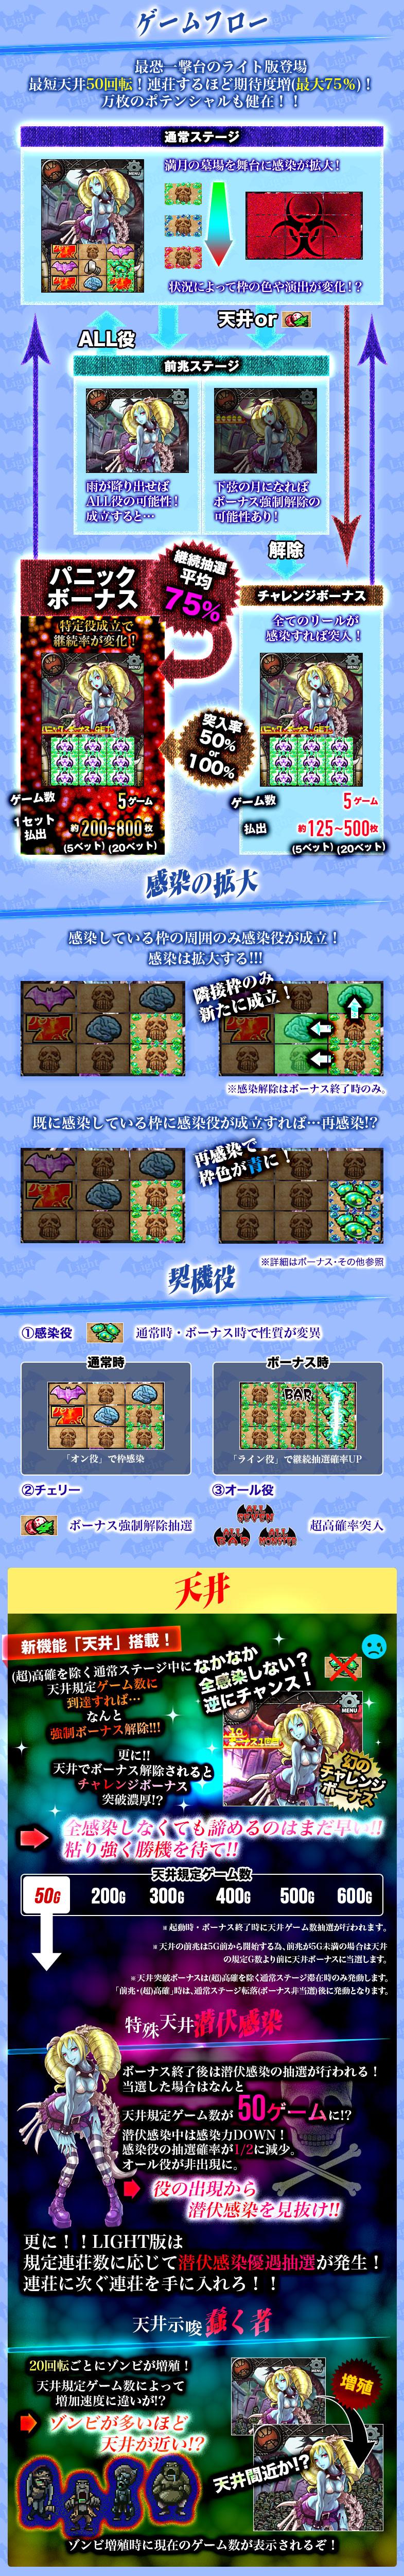 MONSTERS-ゾンビ-Light ゲームフロー